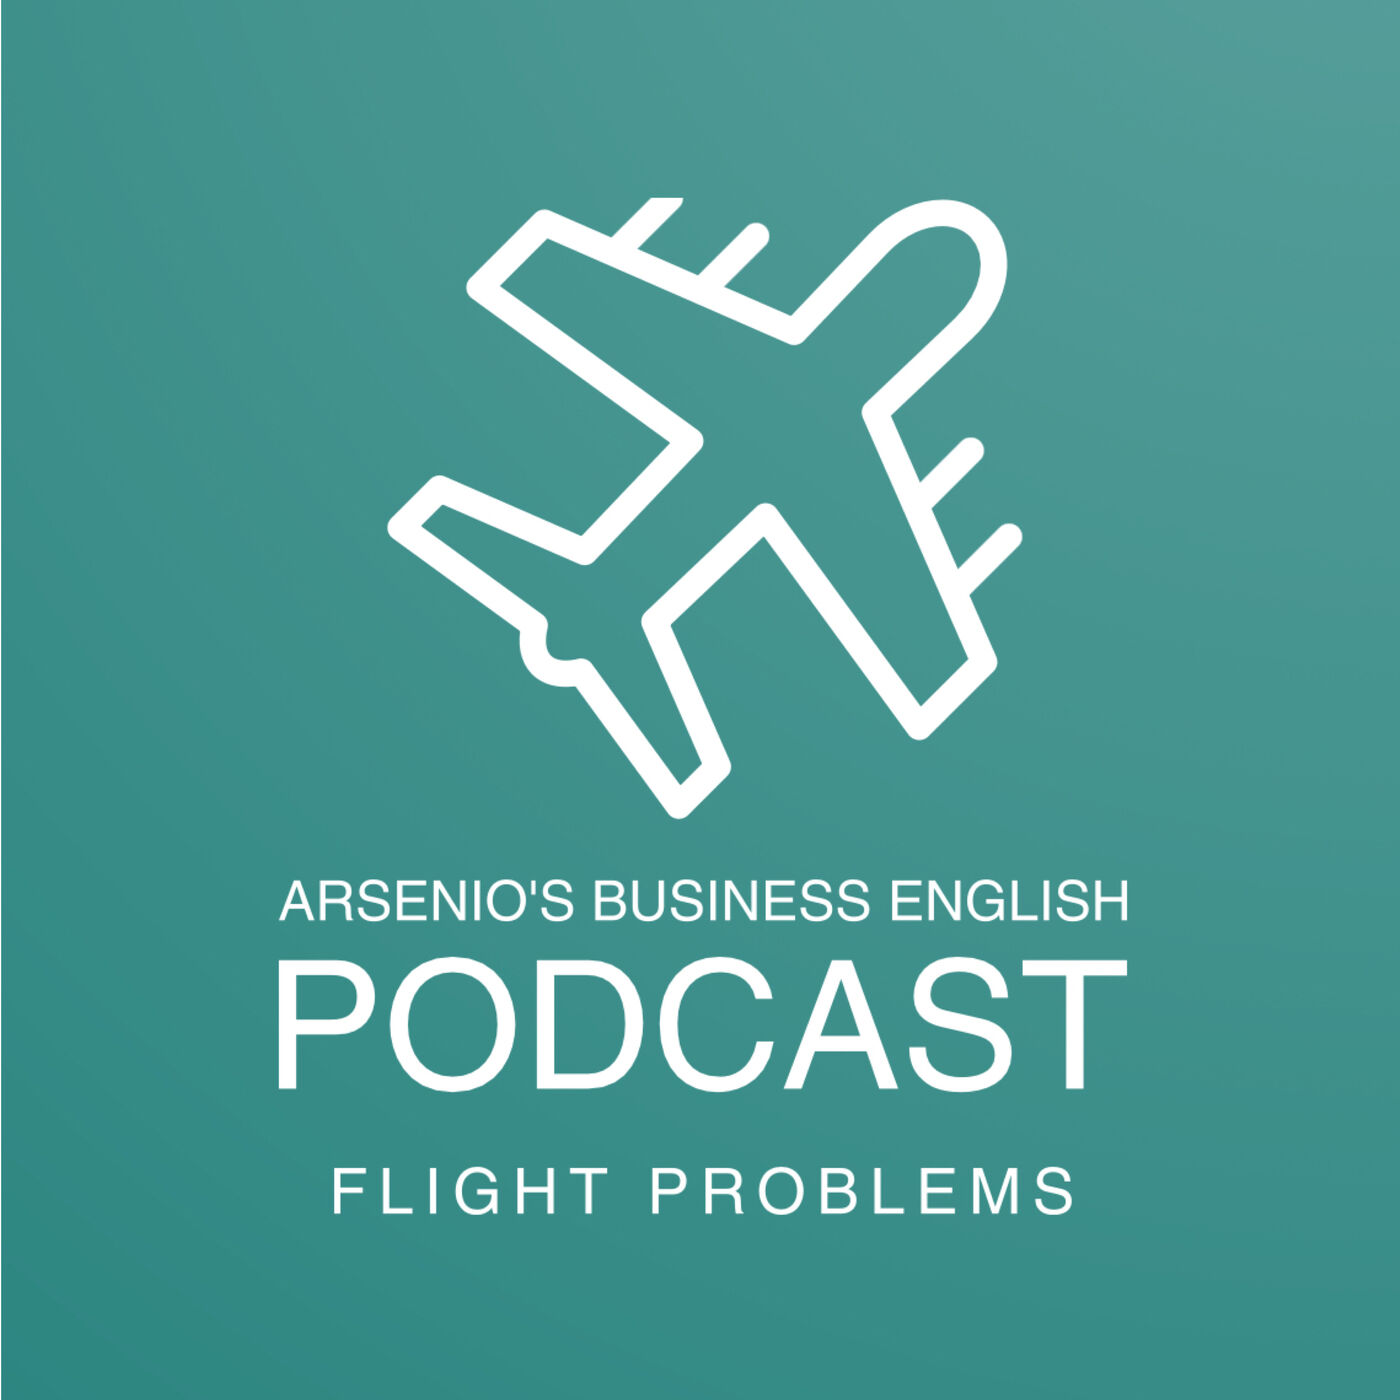 Arsenio's Business English Podcast | Season 6: Episode 32 | Flight Problems & What To Do